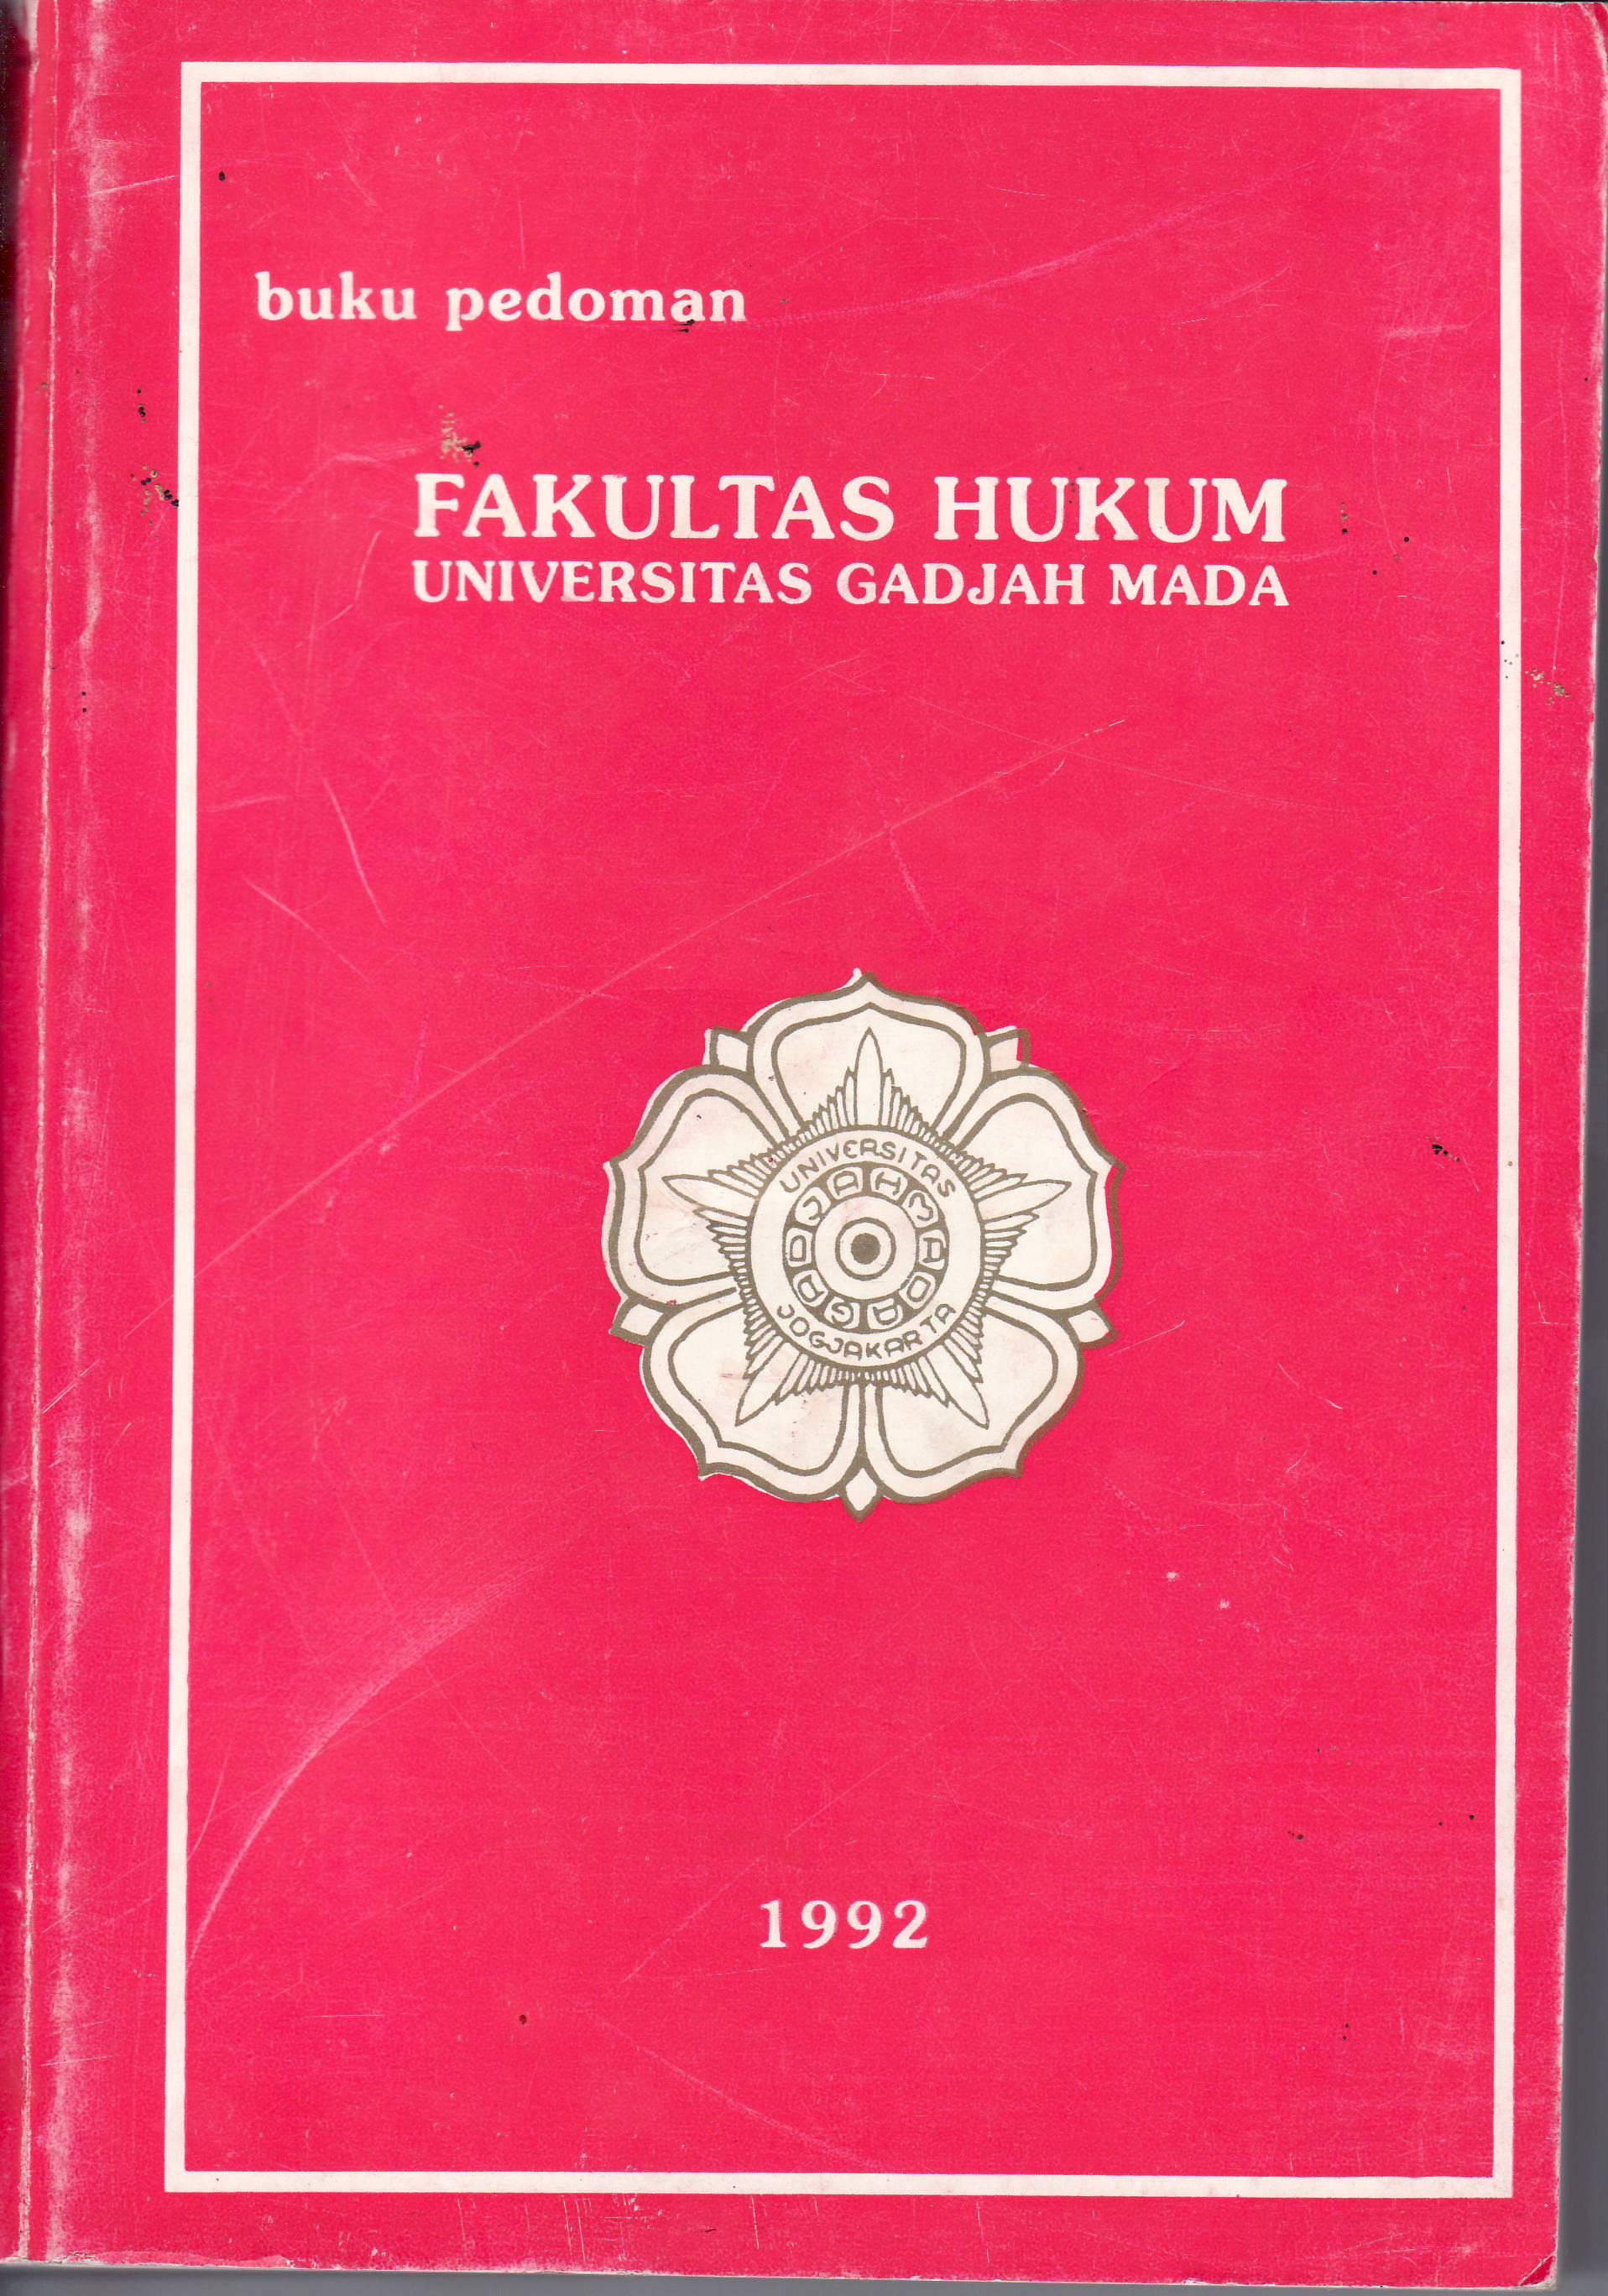 Buku Pedoman Fh Ugm 1992 Studi Hukum